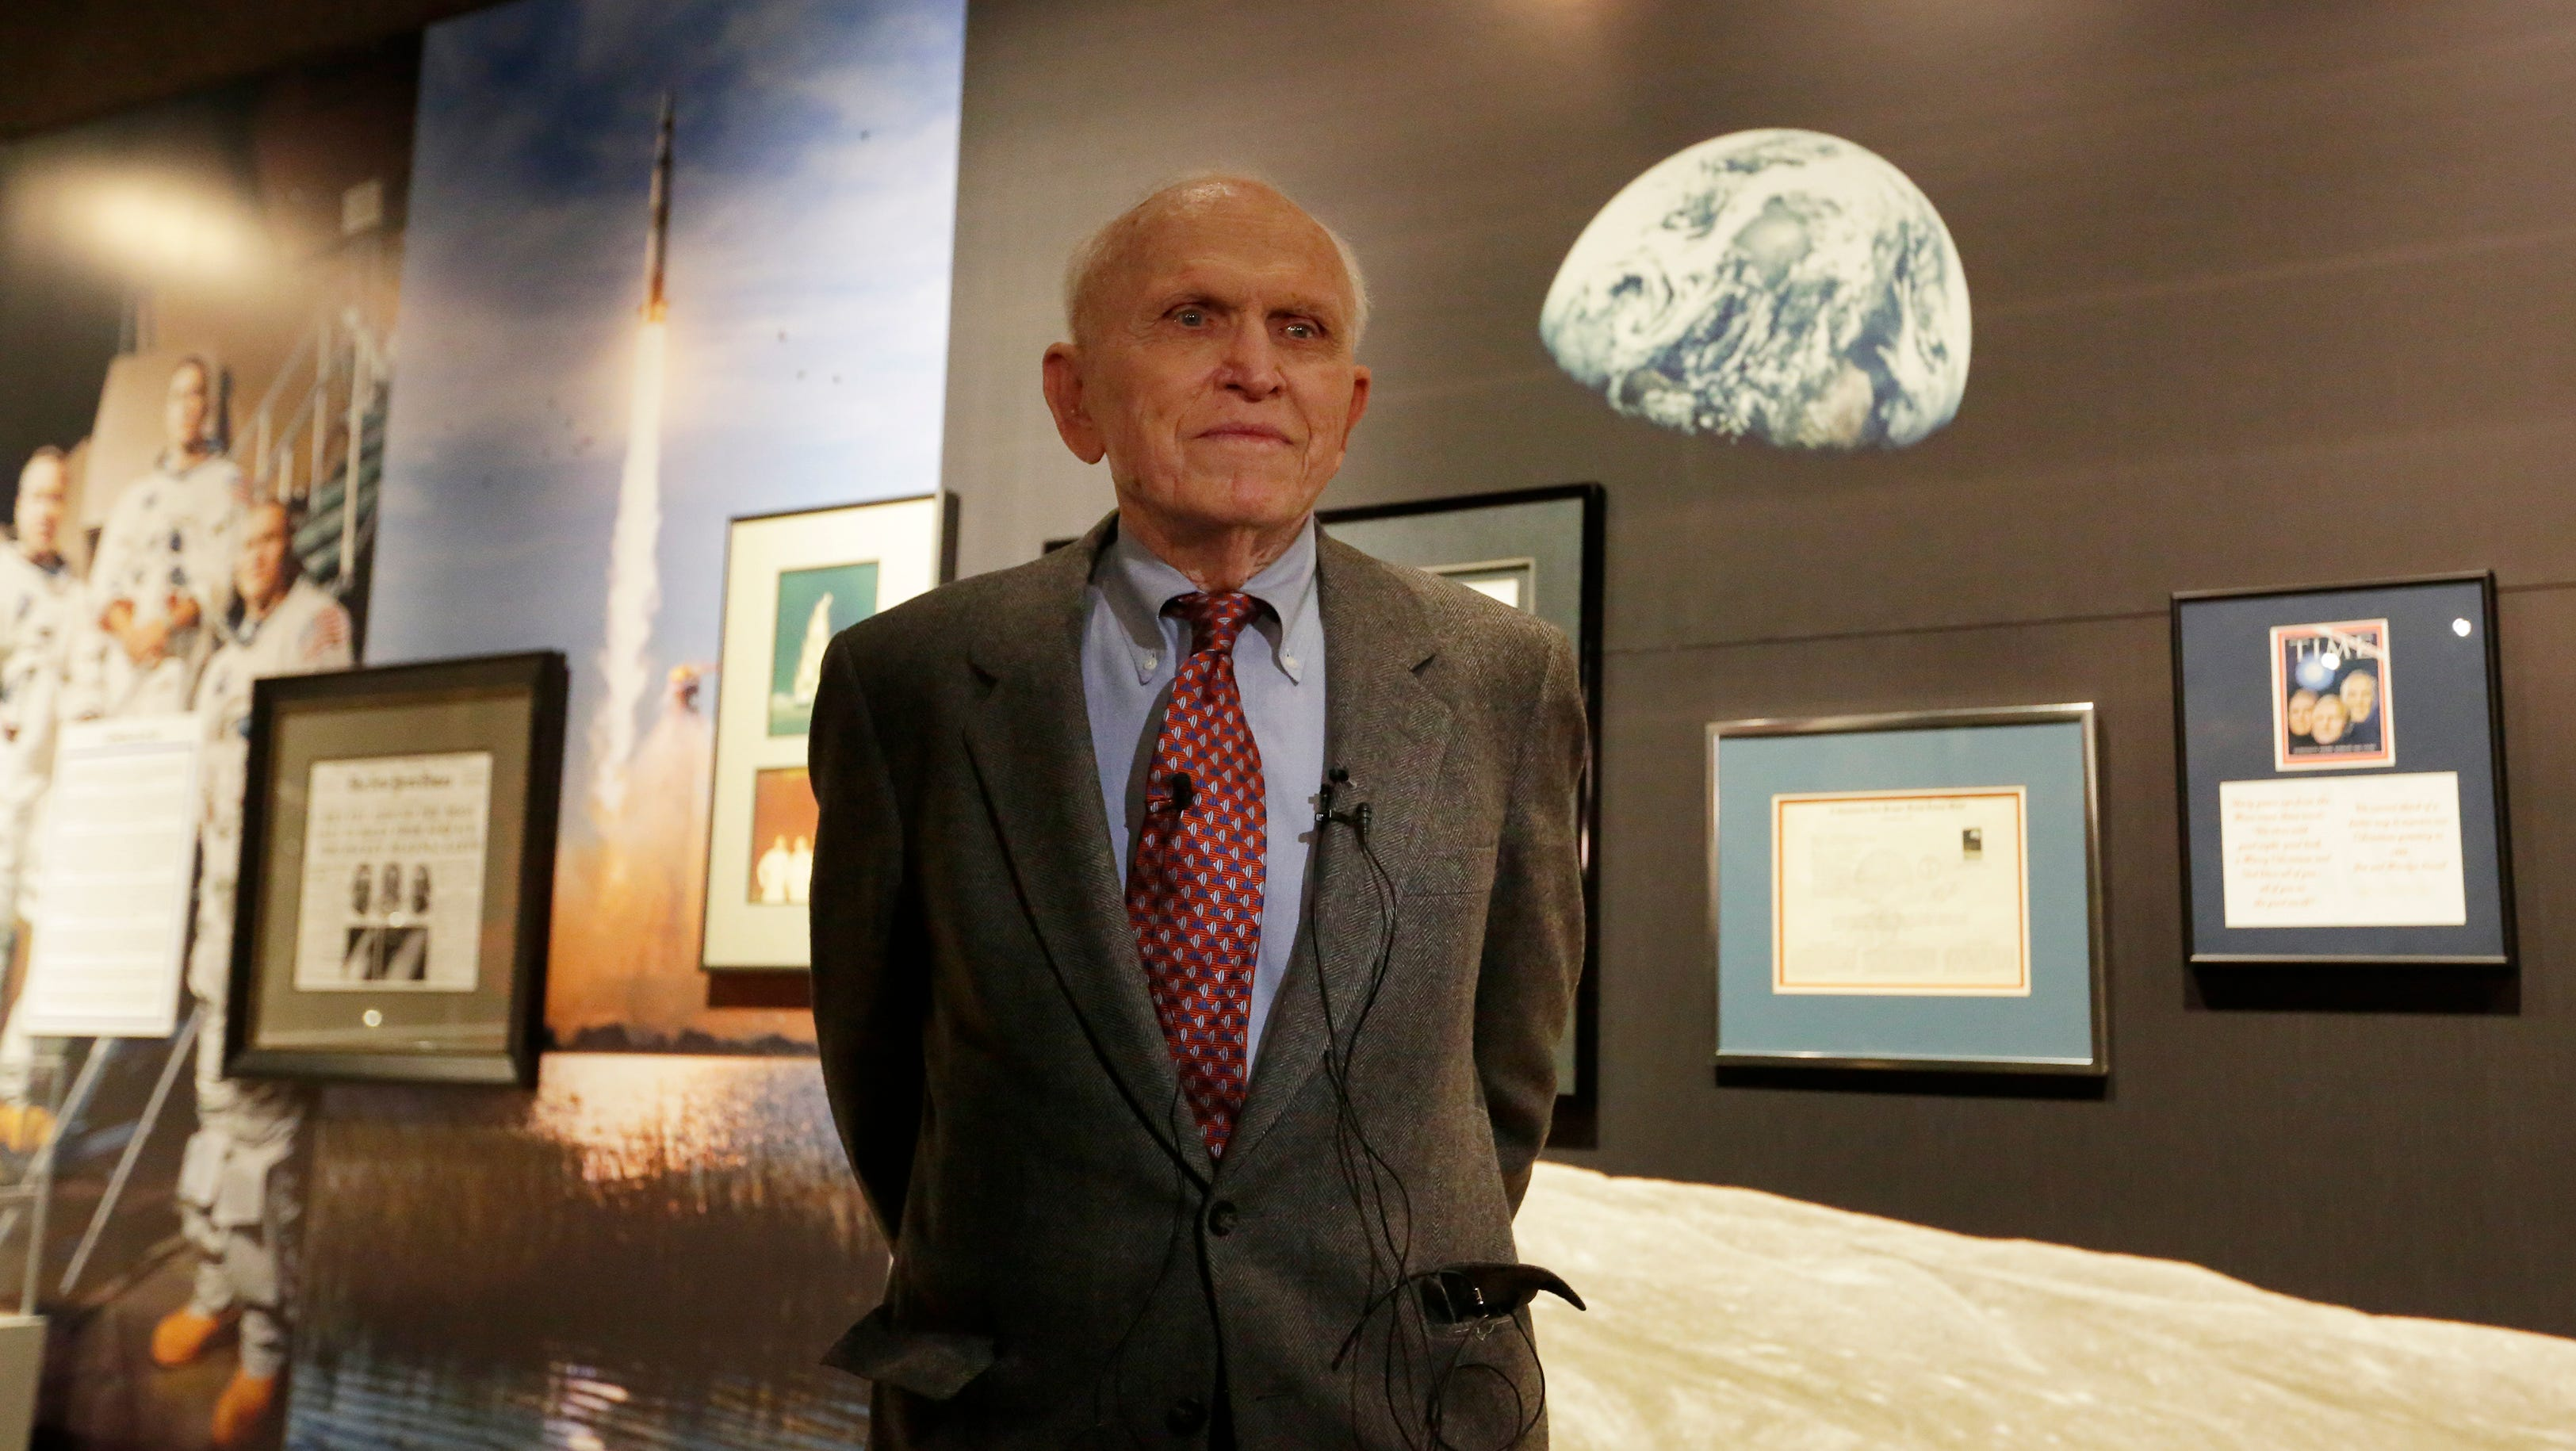 EAA opens exhibit on Frank Borman, commander of Apollo 8